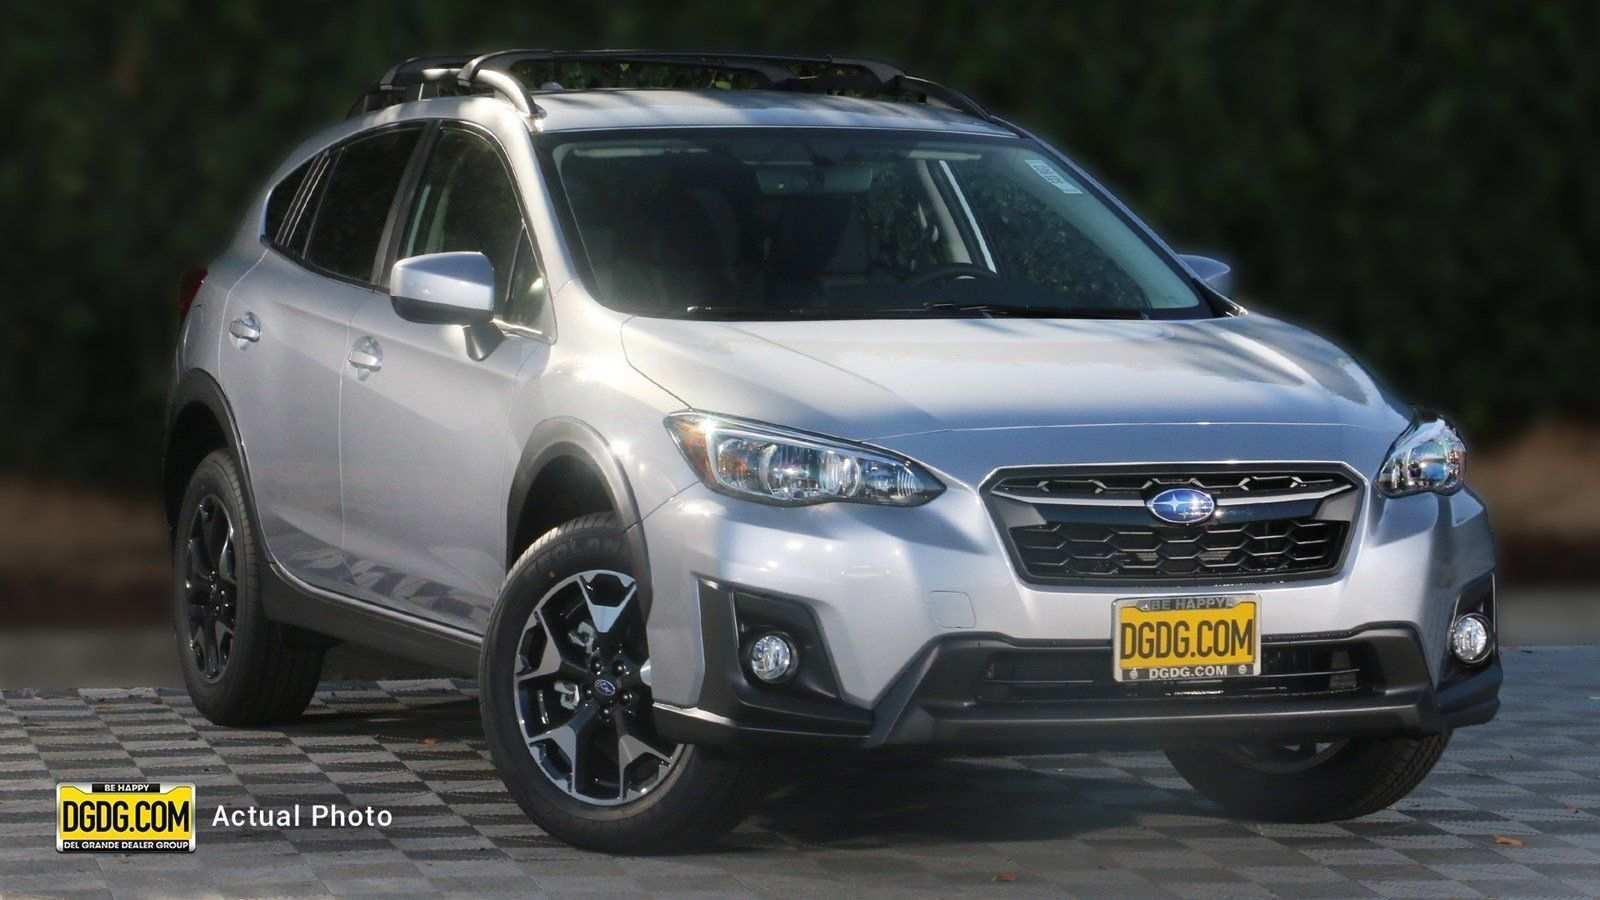 23 Gallery of New Subaru Crosstrek 2019 Review Redesign And Concept Model with New Subaru Crosstrek 2019 Review Redesign And Concept